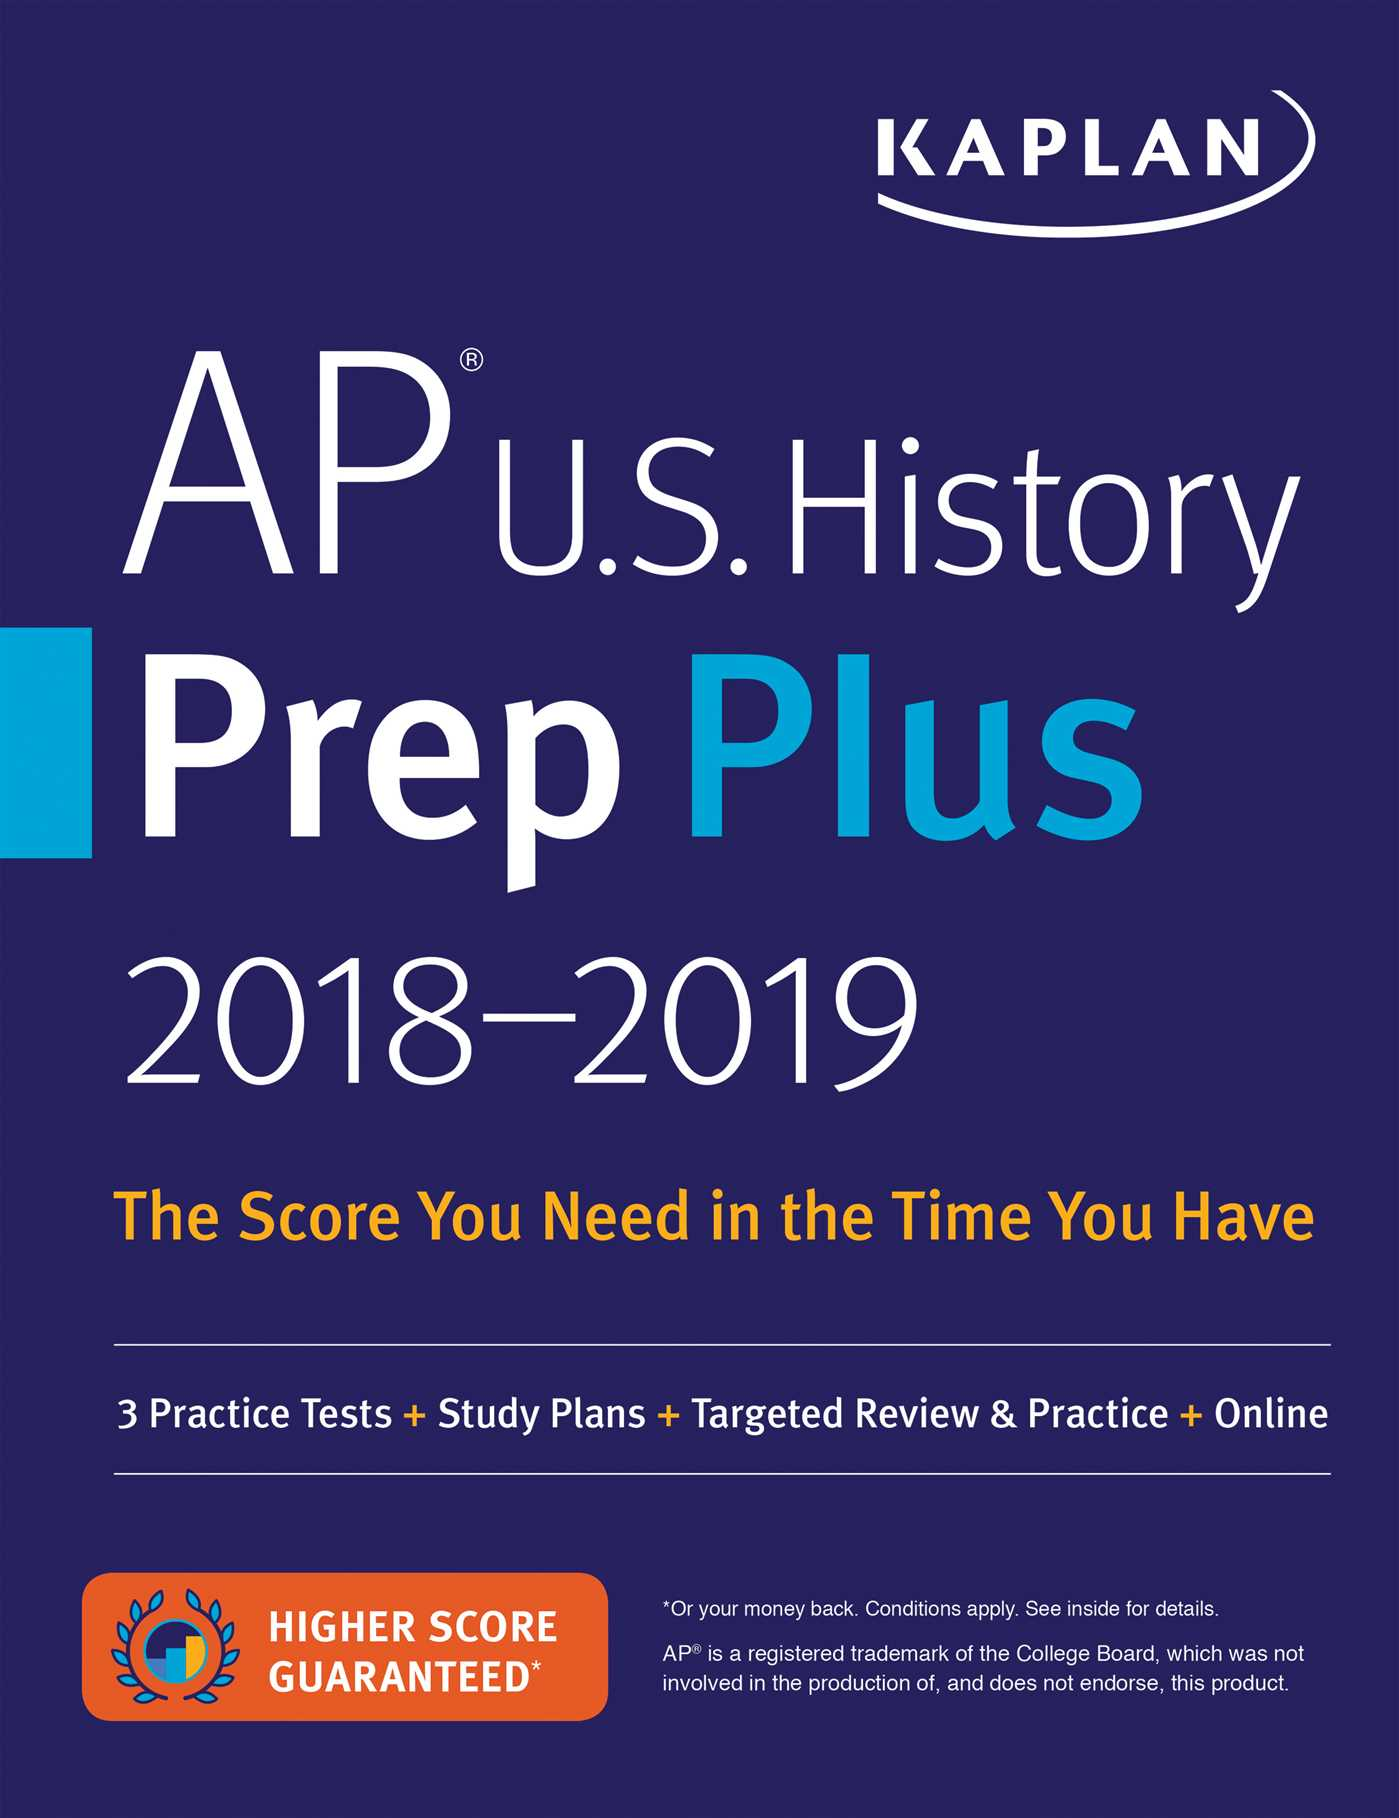 Ap u s history prep plus 2018 2019 9781506203362 hr